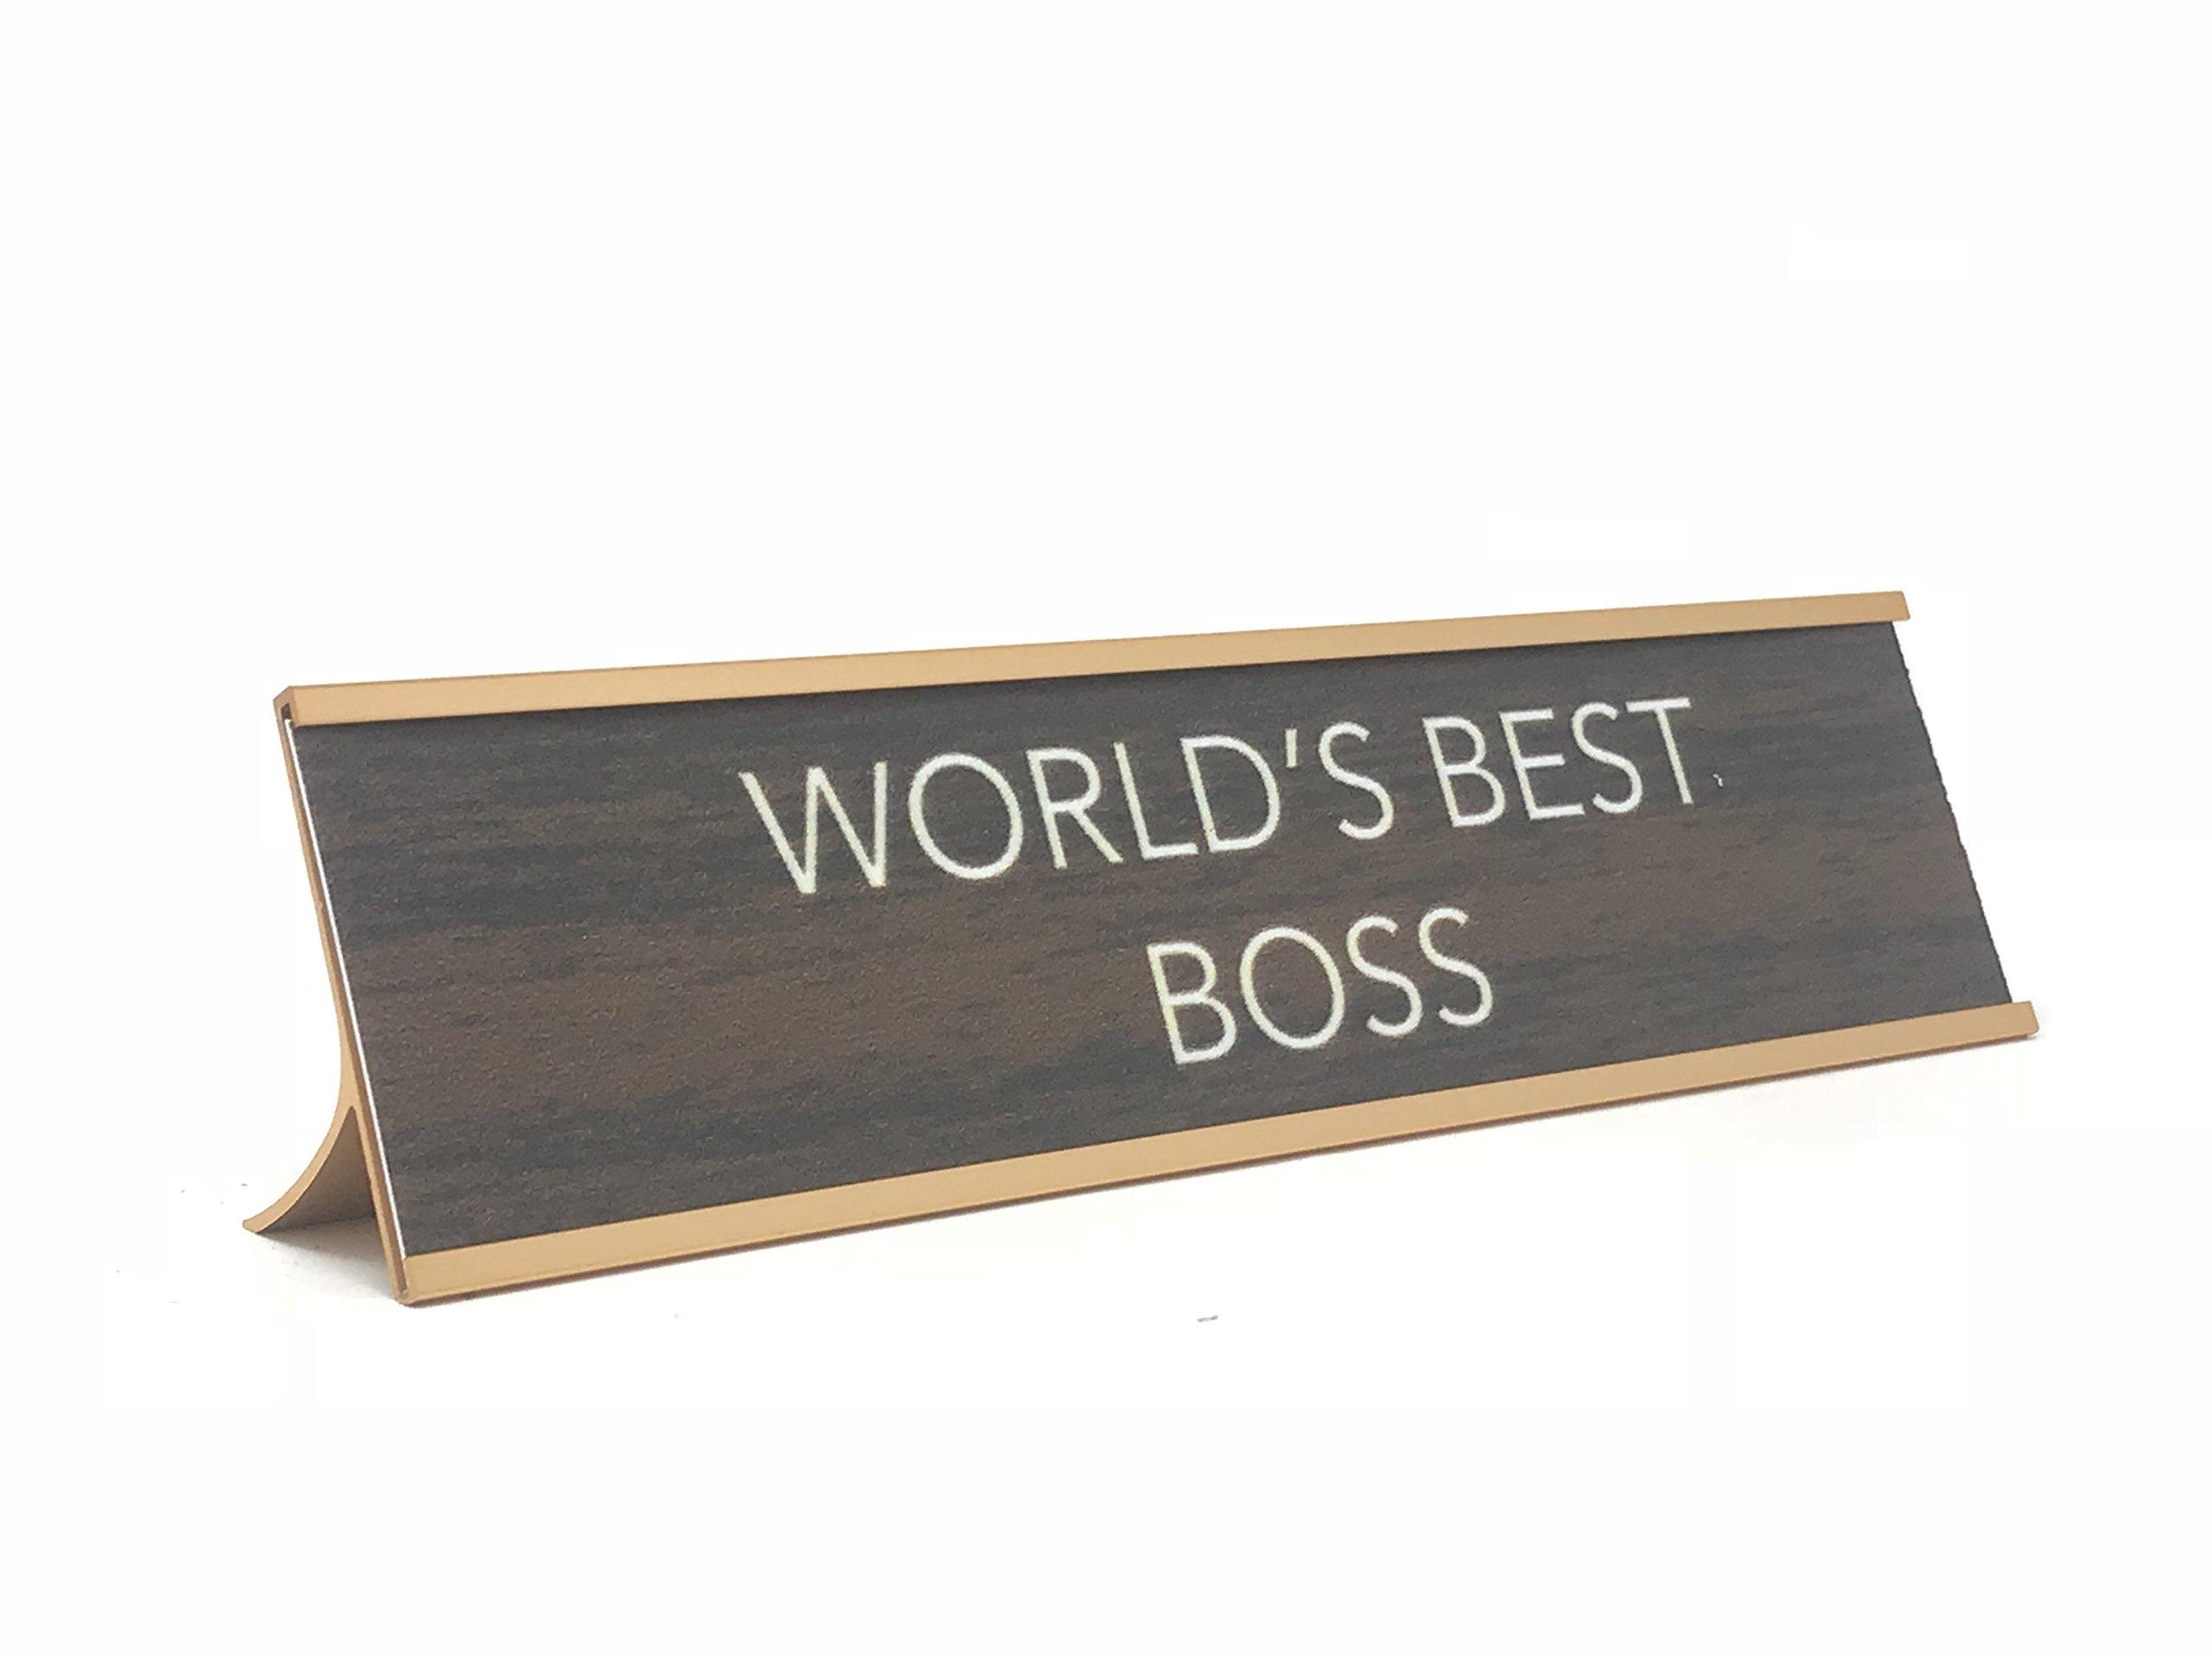 Aahs Engraving ''World's Best. Novelty Nameplate Style Desk Sign (Brown/Gold, World's Best Boss)